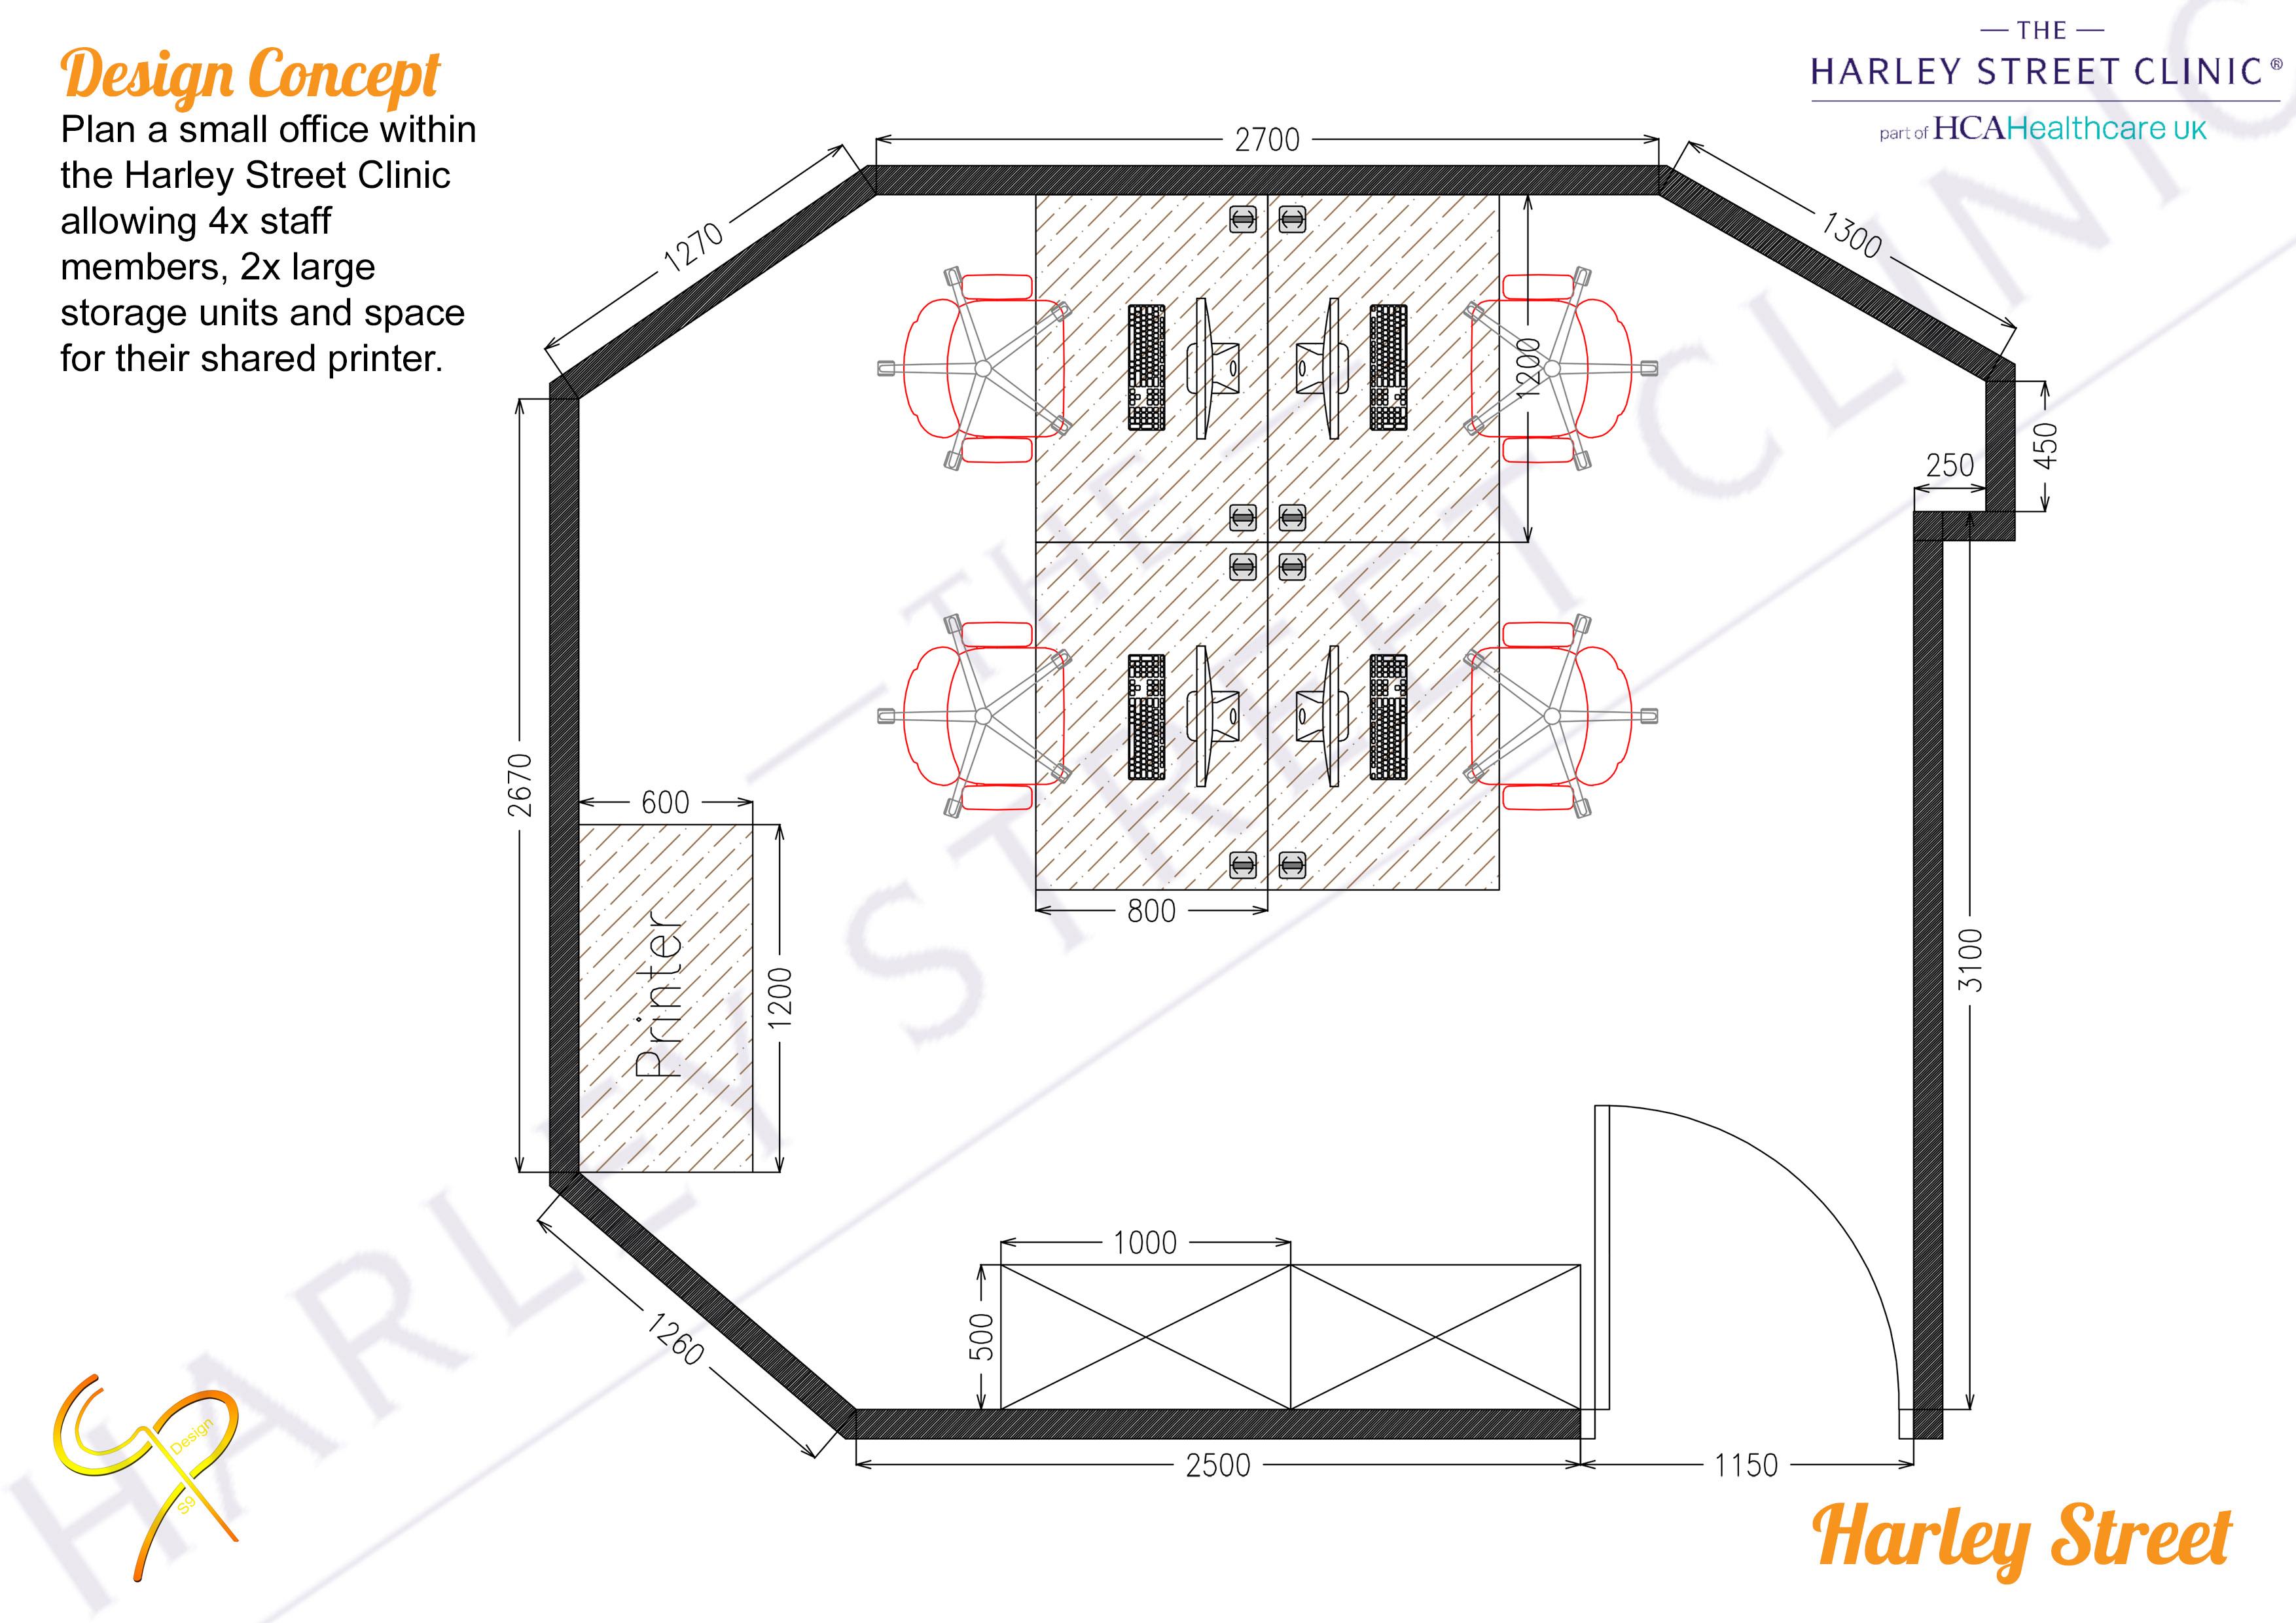 Harley Street Clinic - Office Plan